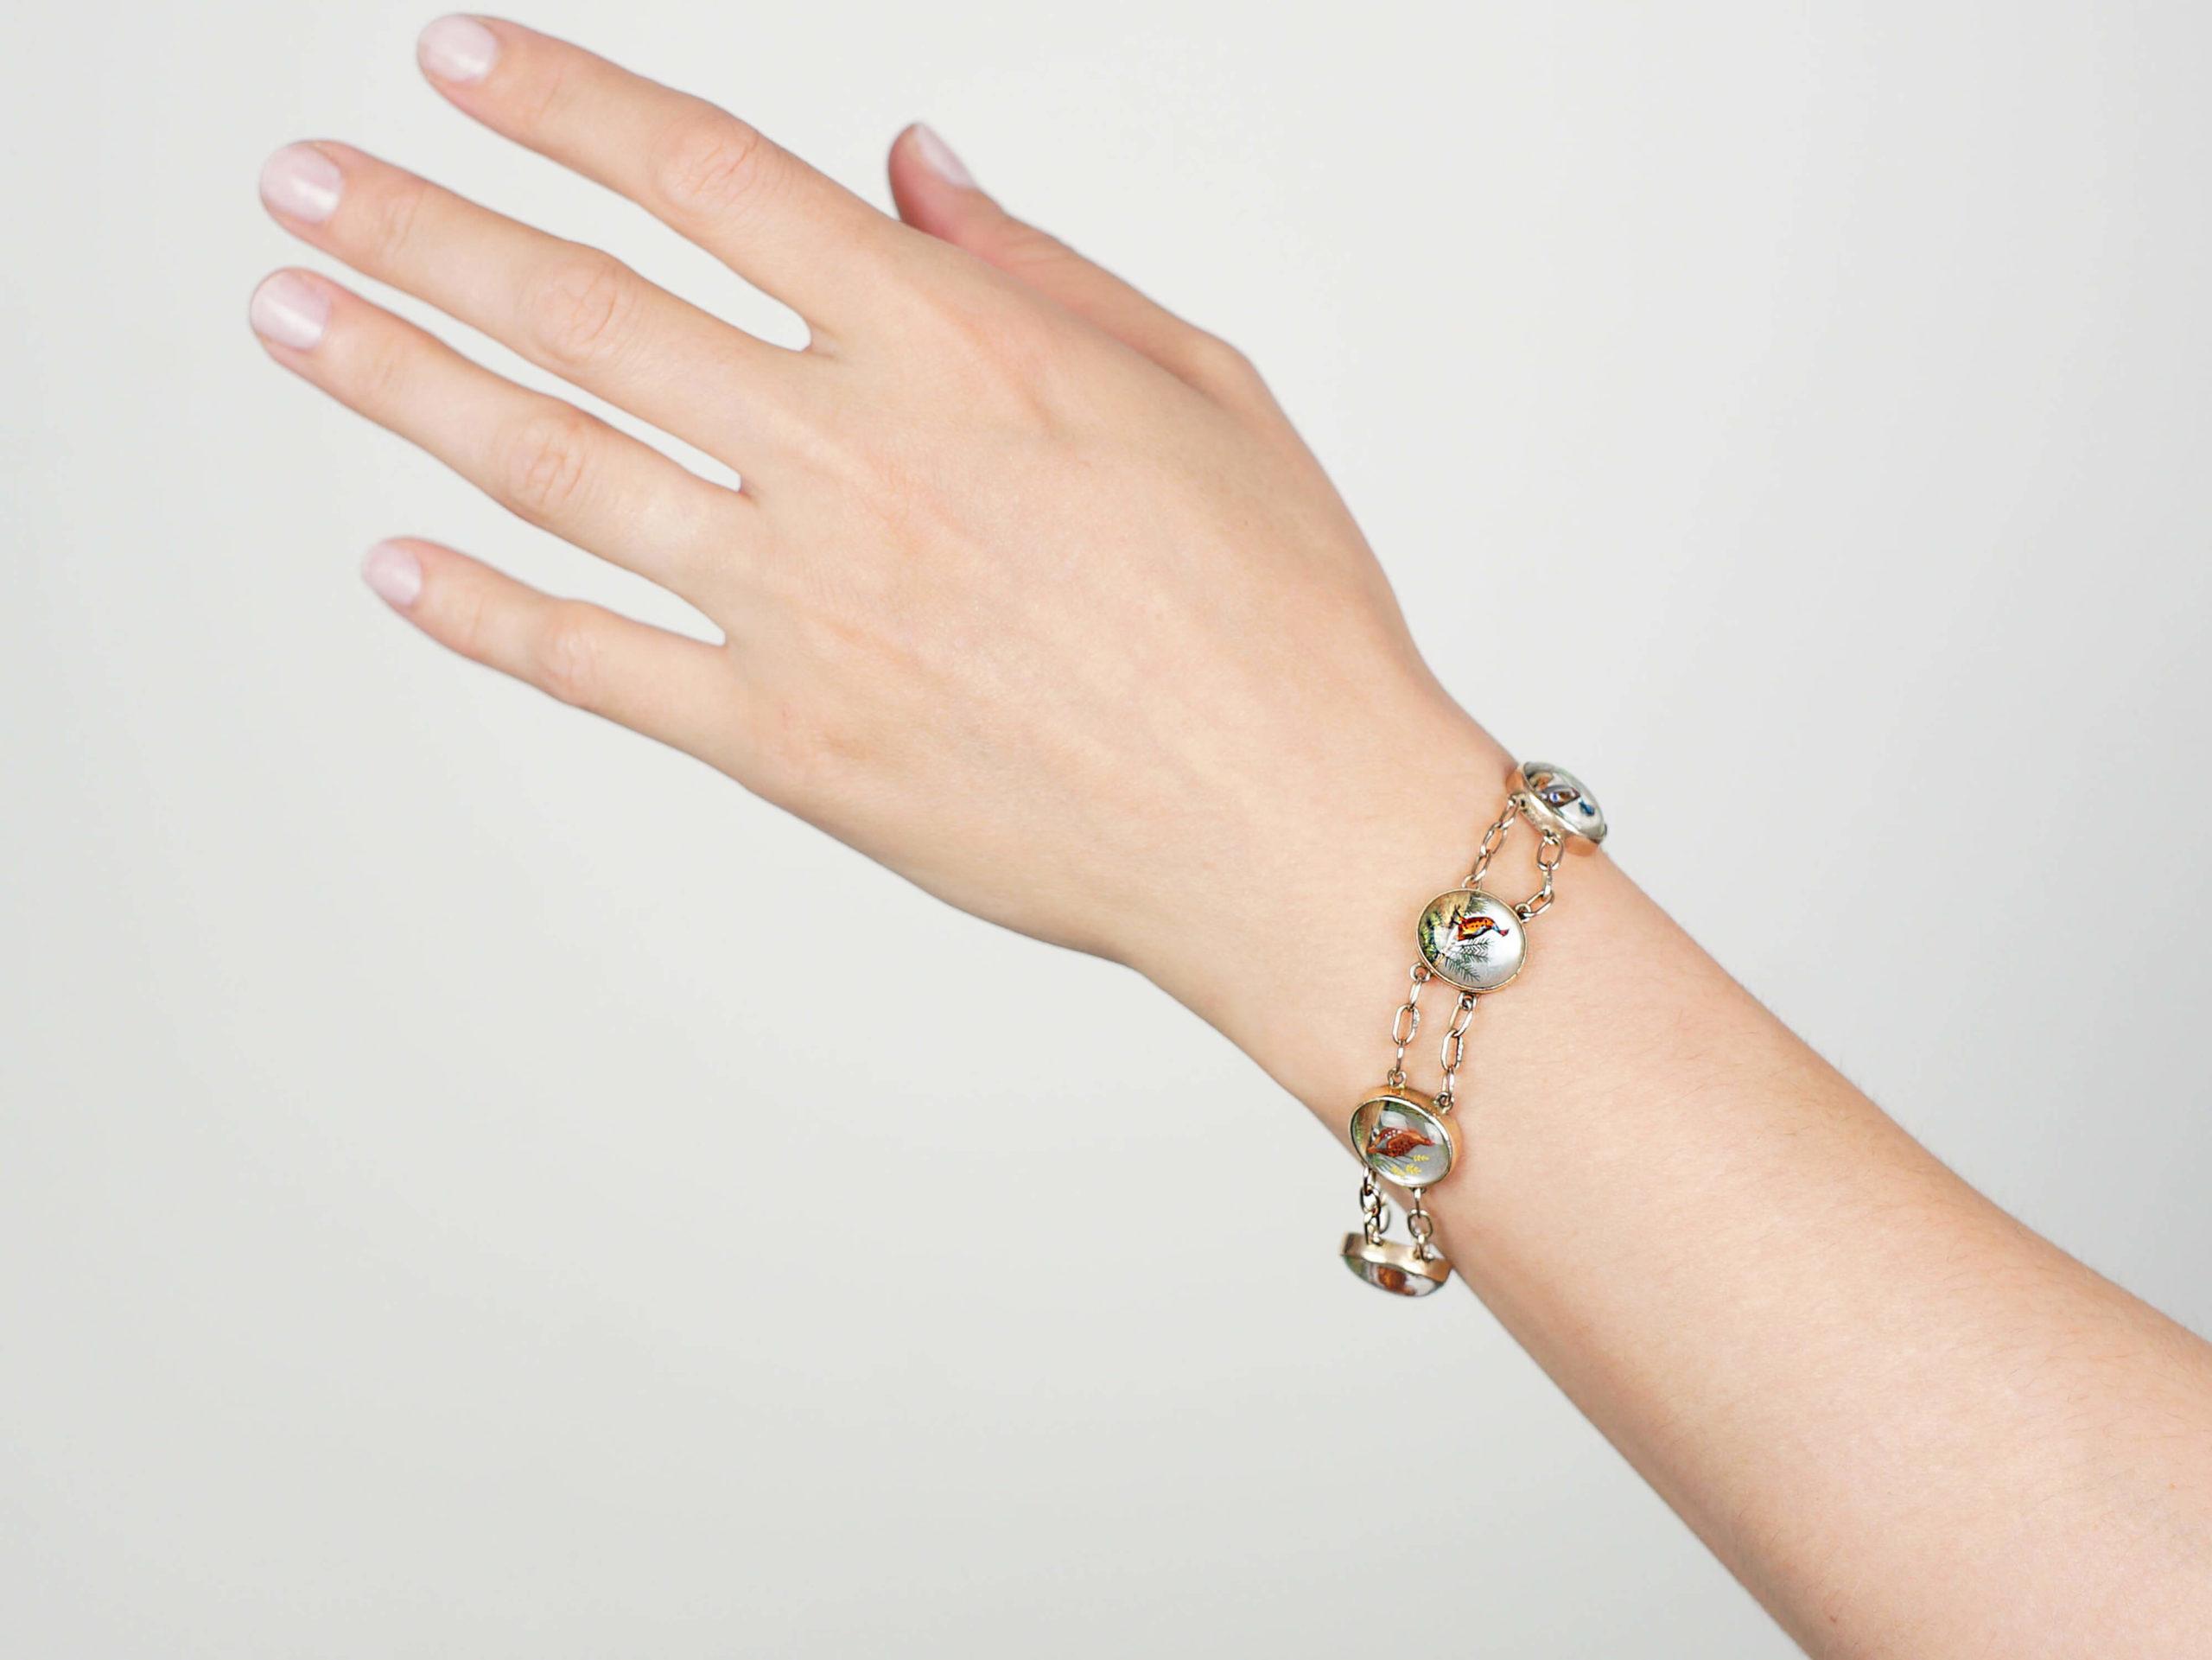 Edwardian 9ct Gold Reverse Intaglio Bracelet of Game Birds